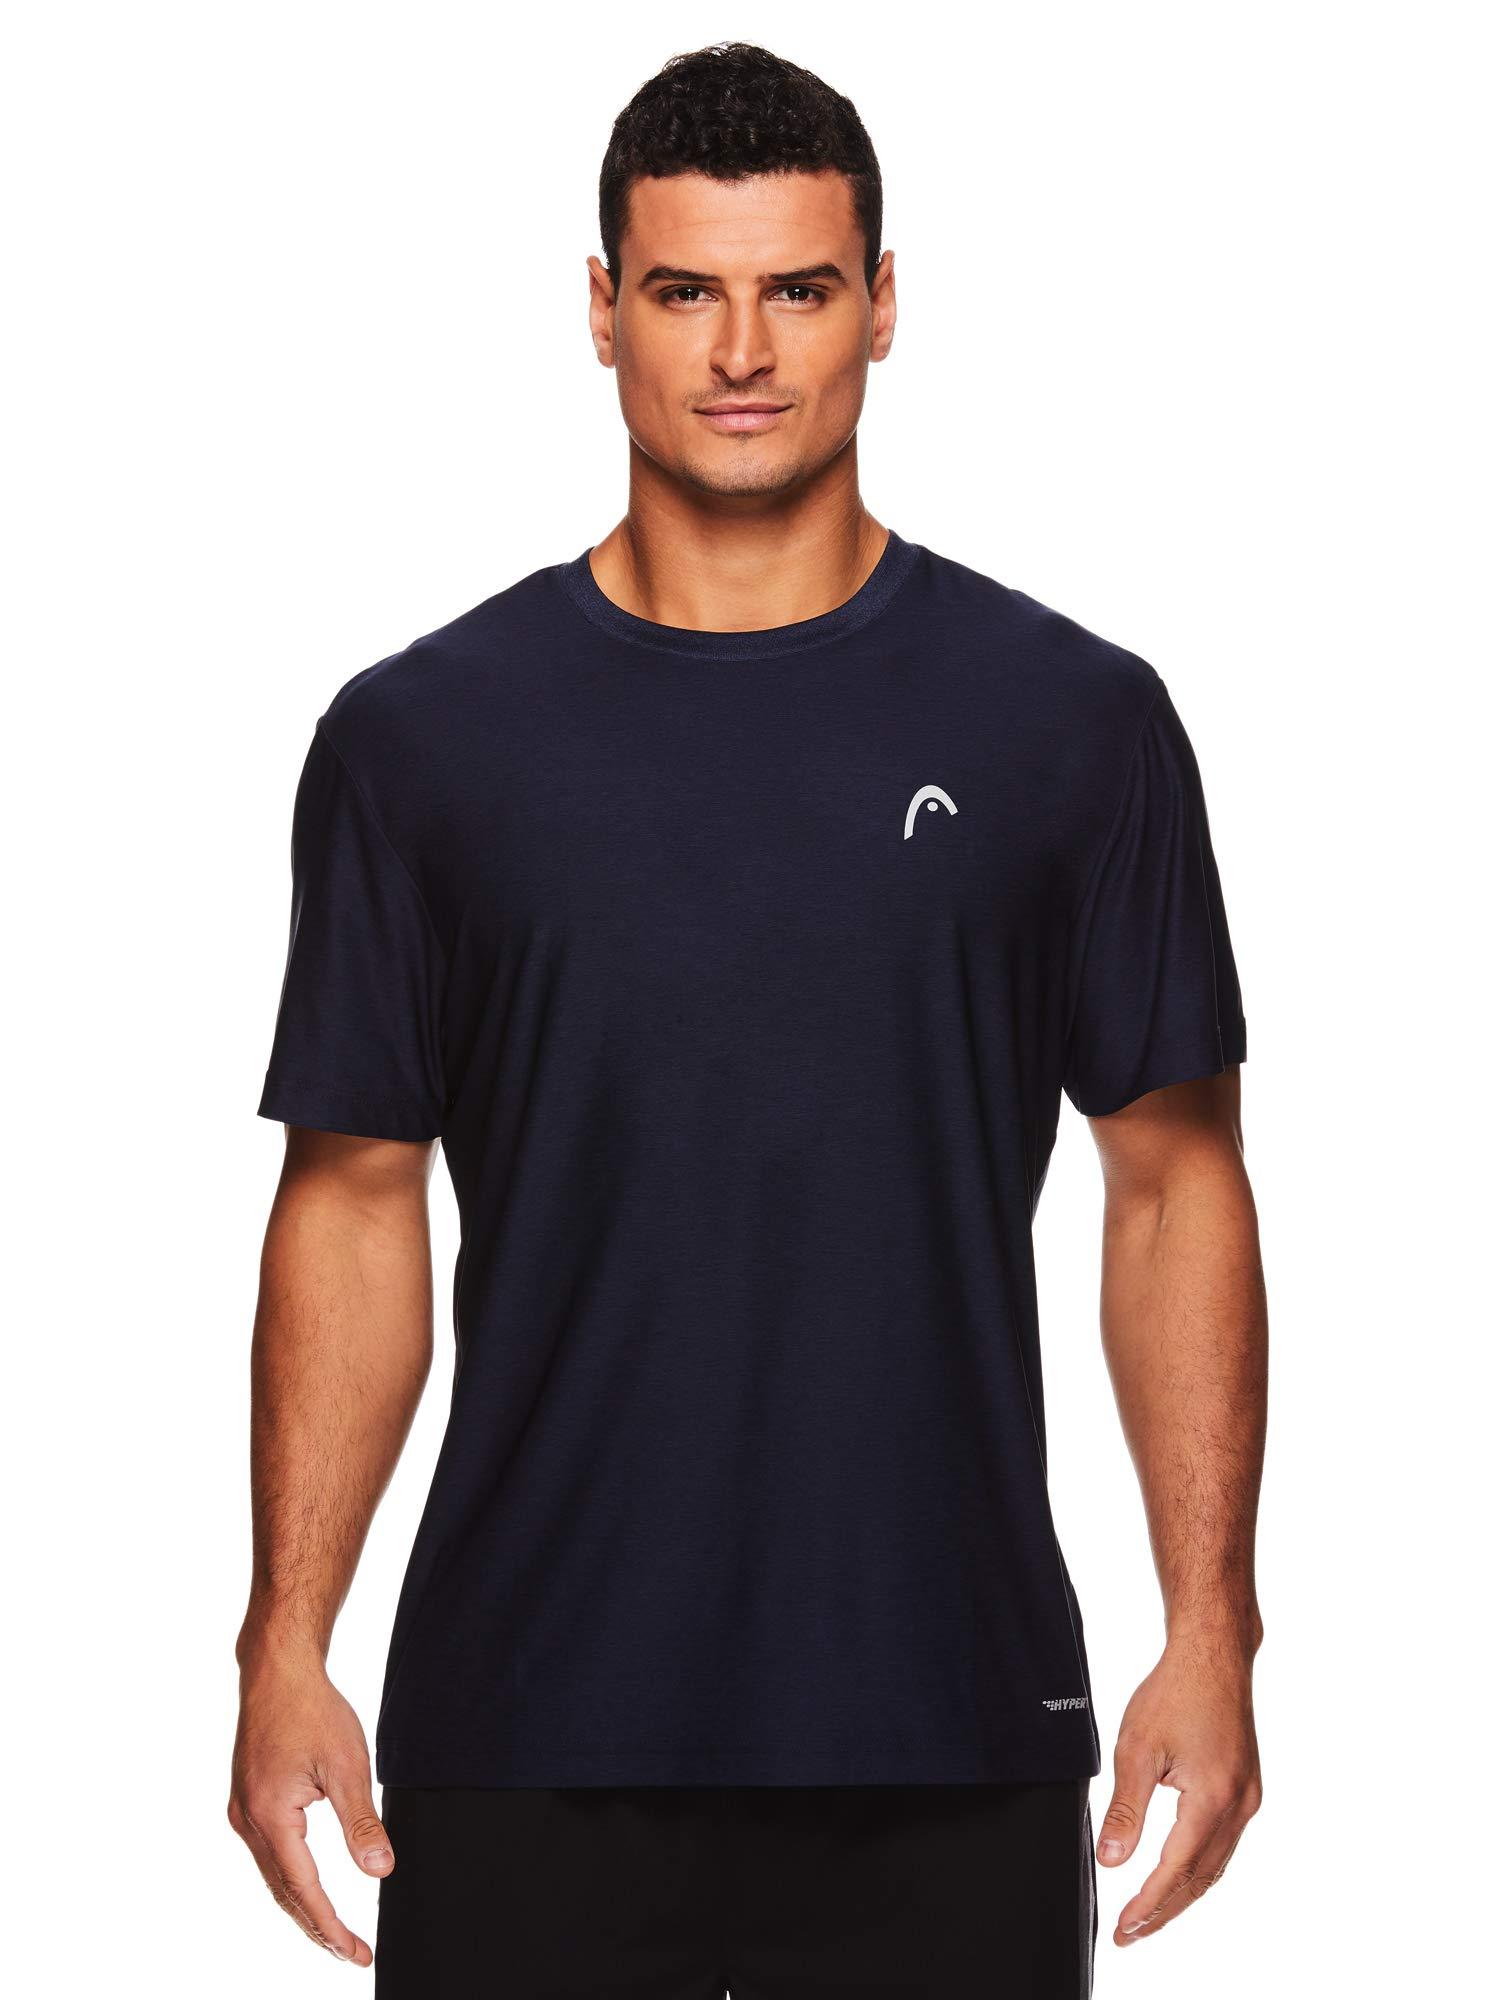 HEAD Men's Hypertek Crewneck Gym Tennis & Workout T-Shirt - Short Sleeve Activewear Top - Score Hypertek Navy Heather, Small